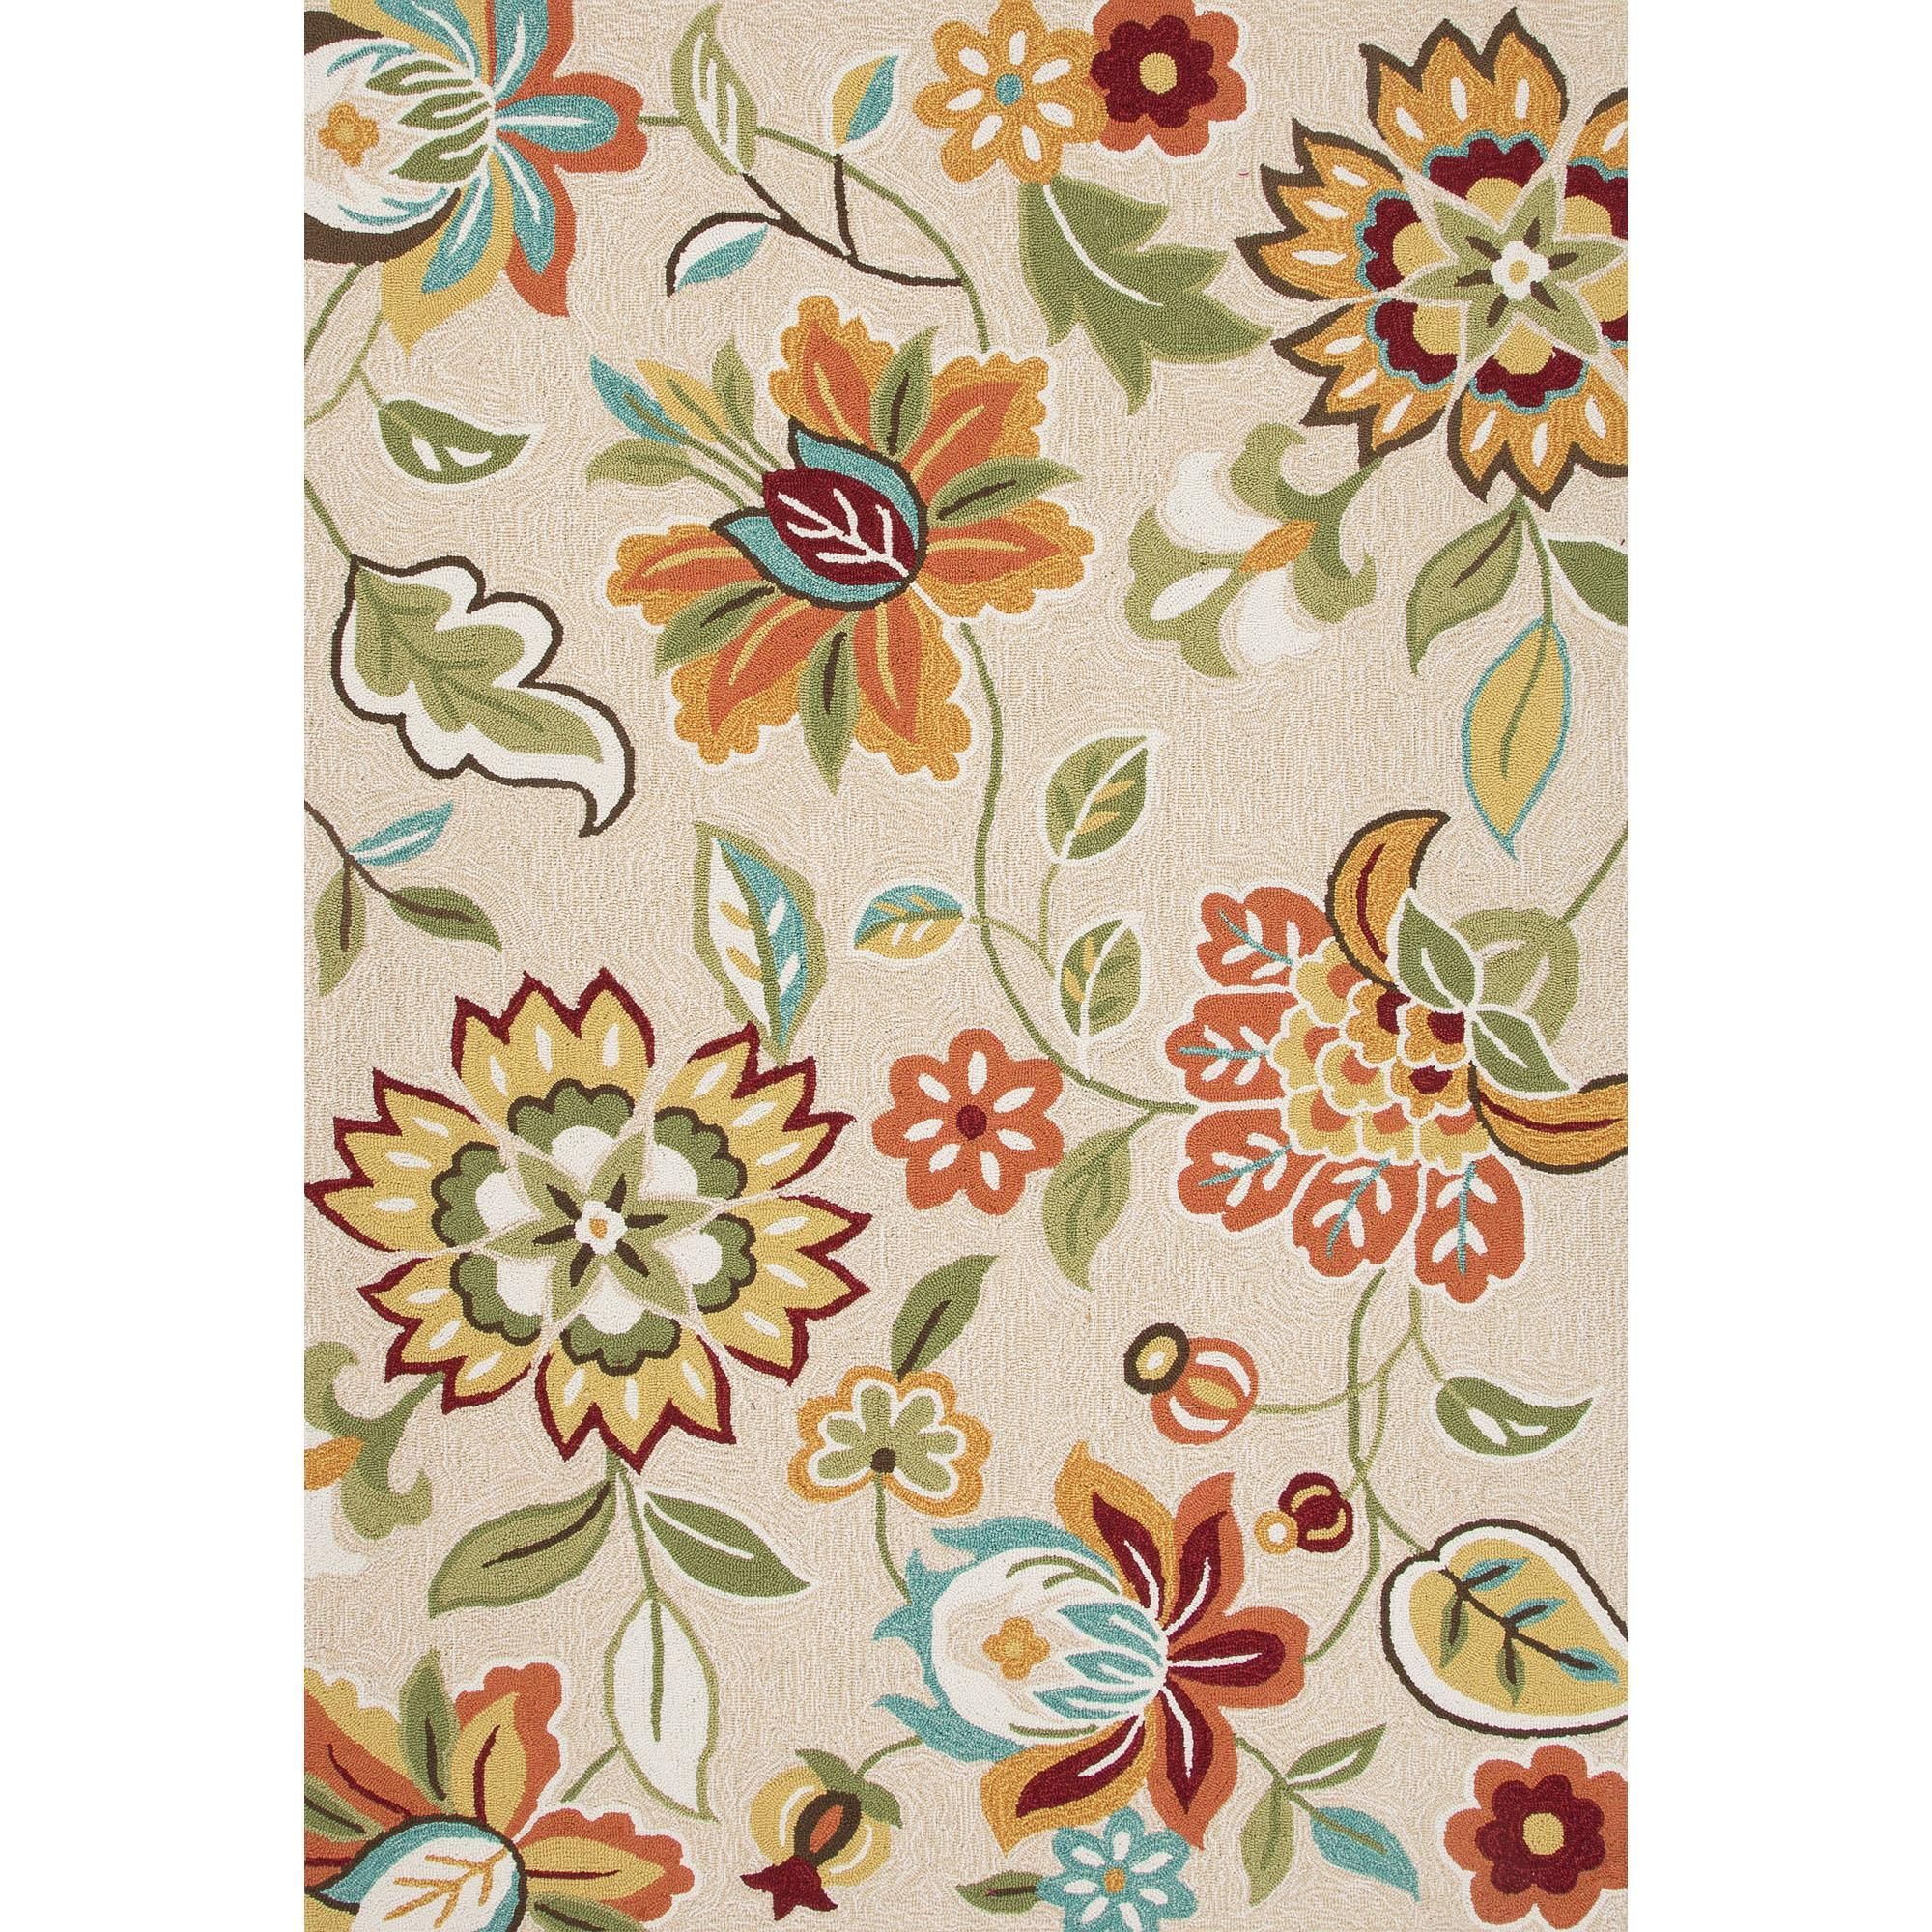 JAIPUR Rugs Blossom 7.6 x 9.6 Rug - Item Number: RUG122610